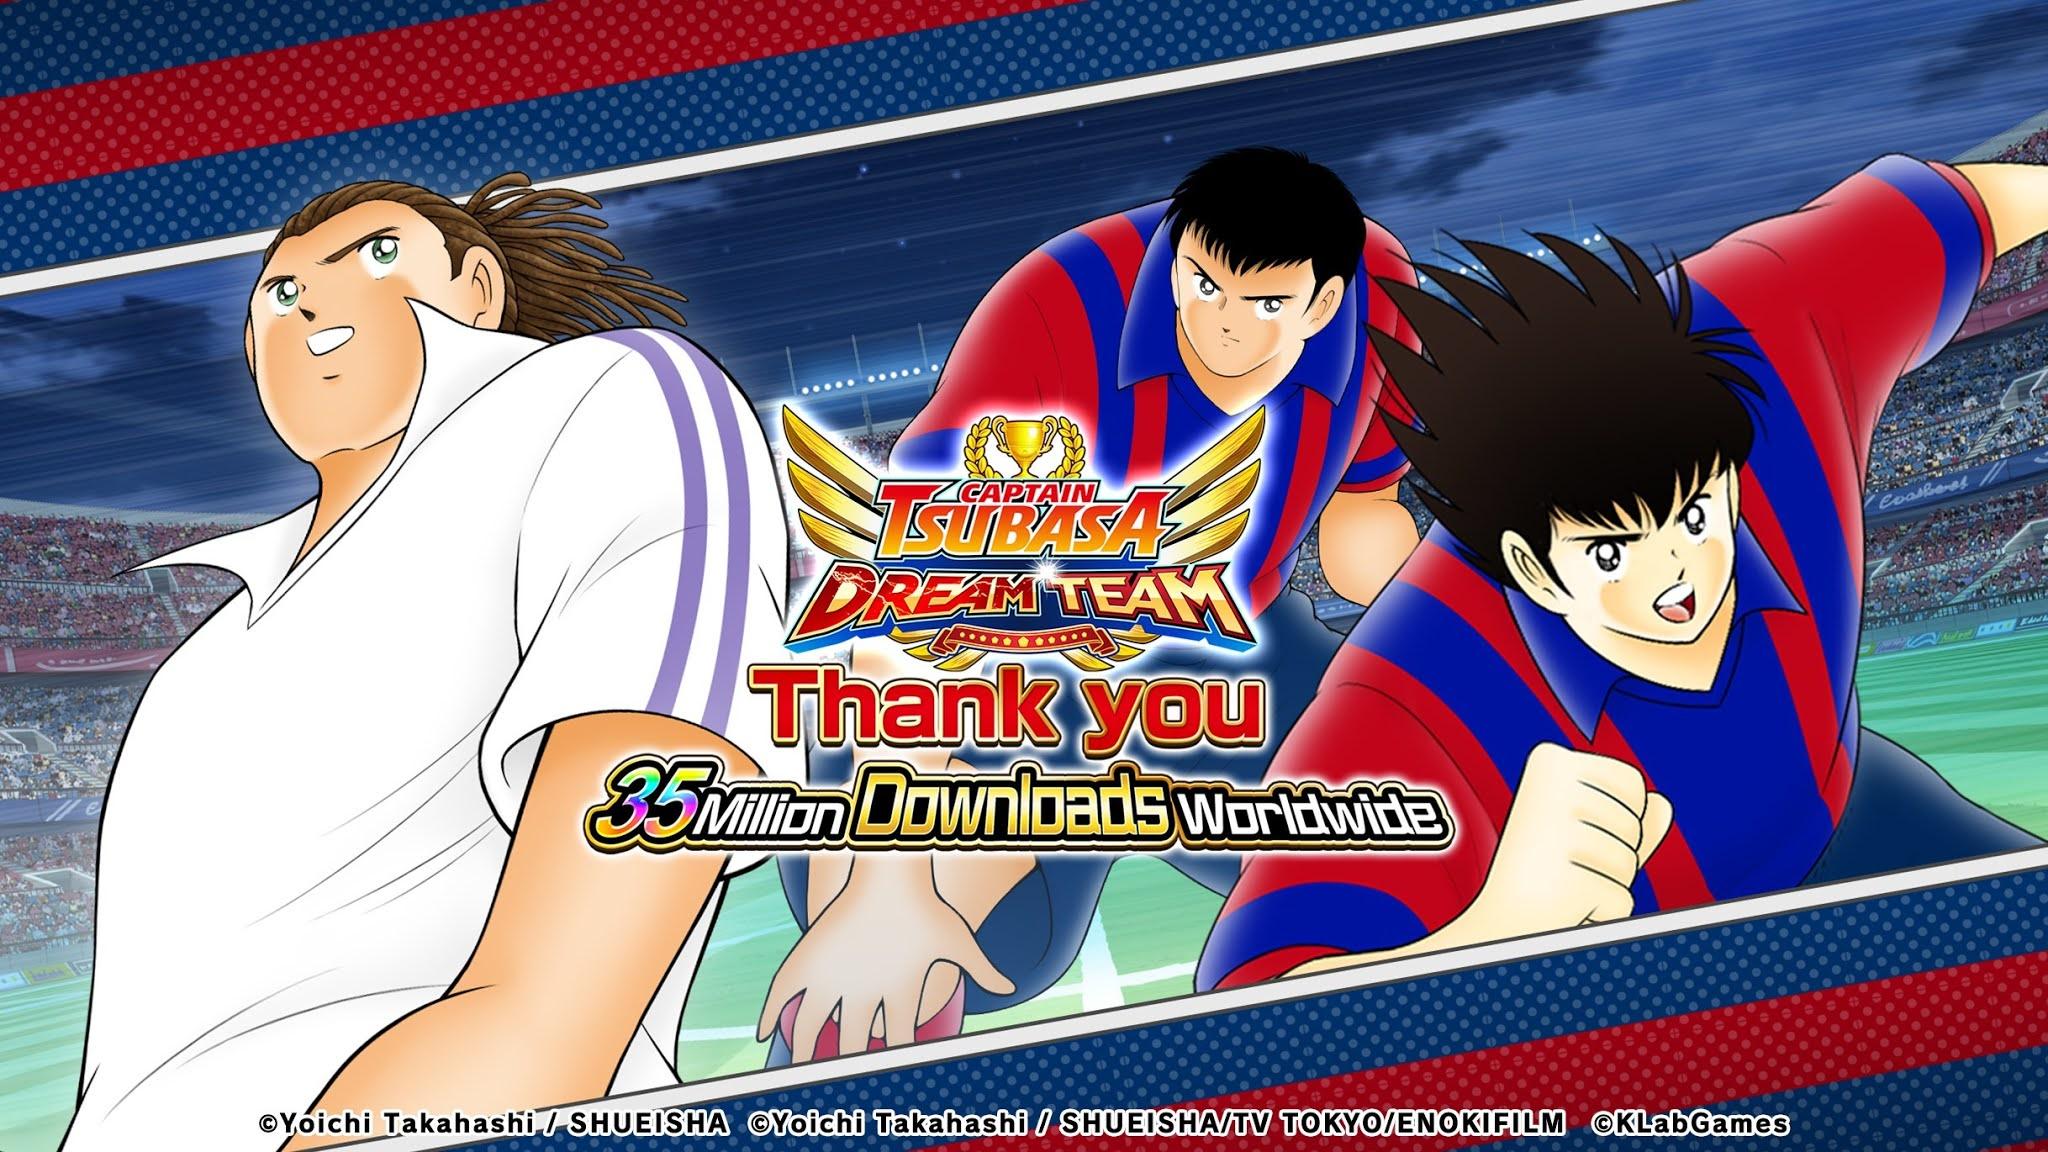 Captain Tsubasa celebrates 35 million downloads